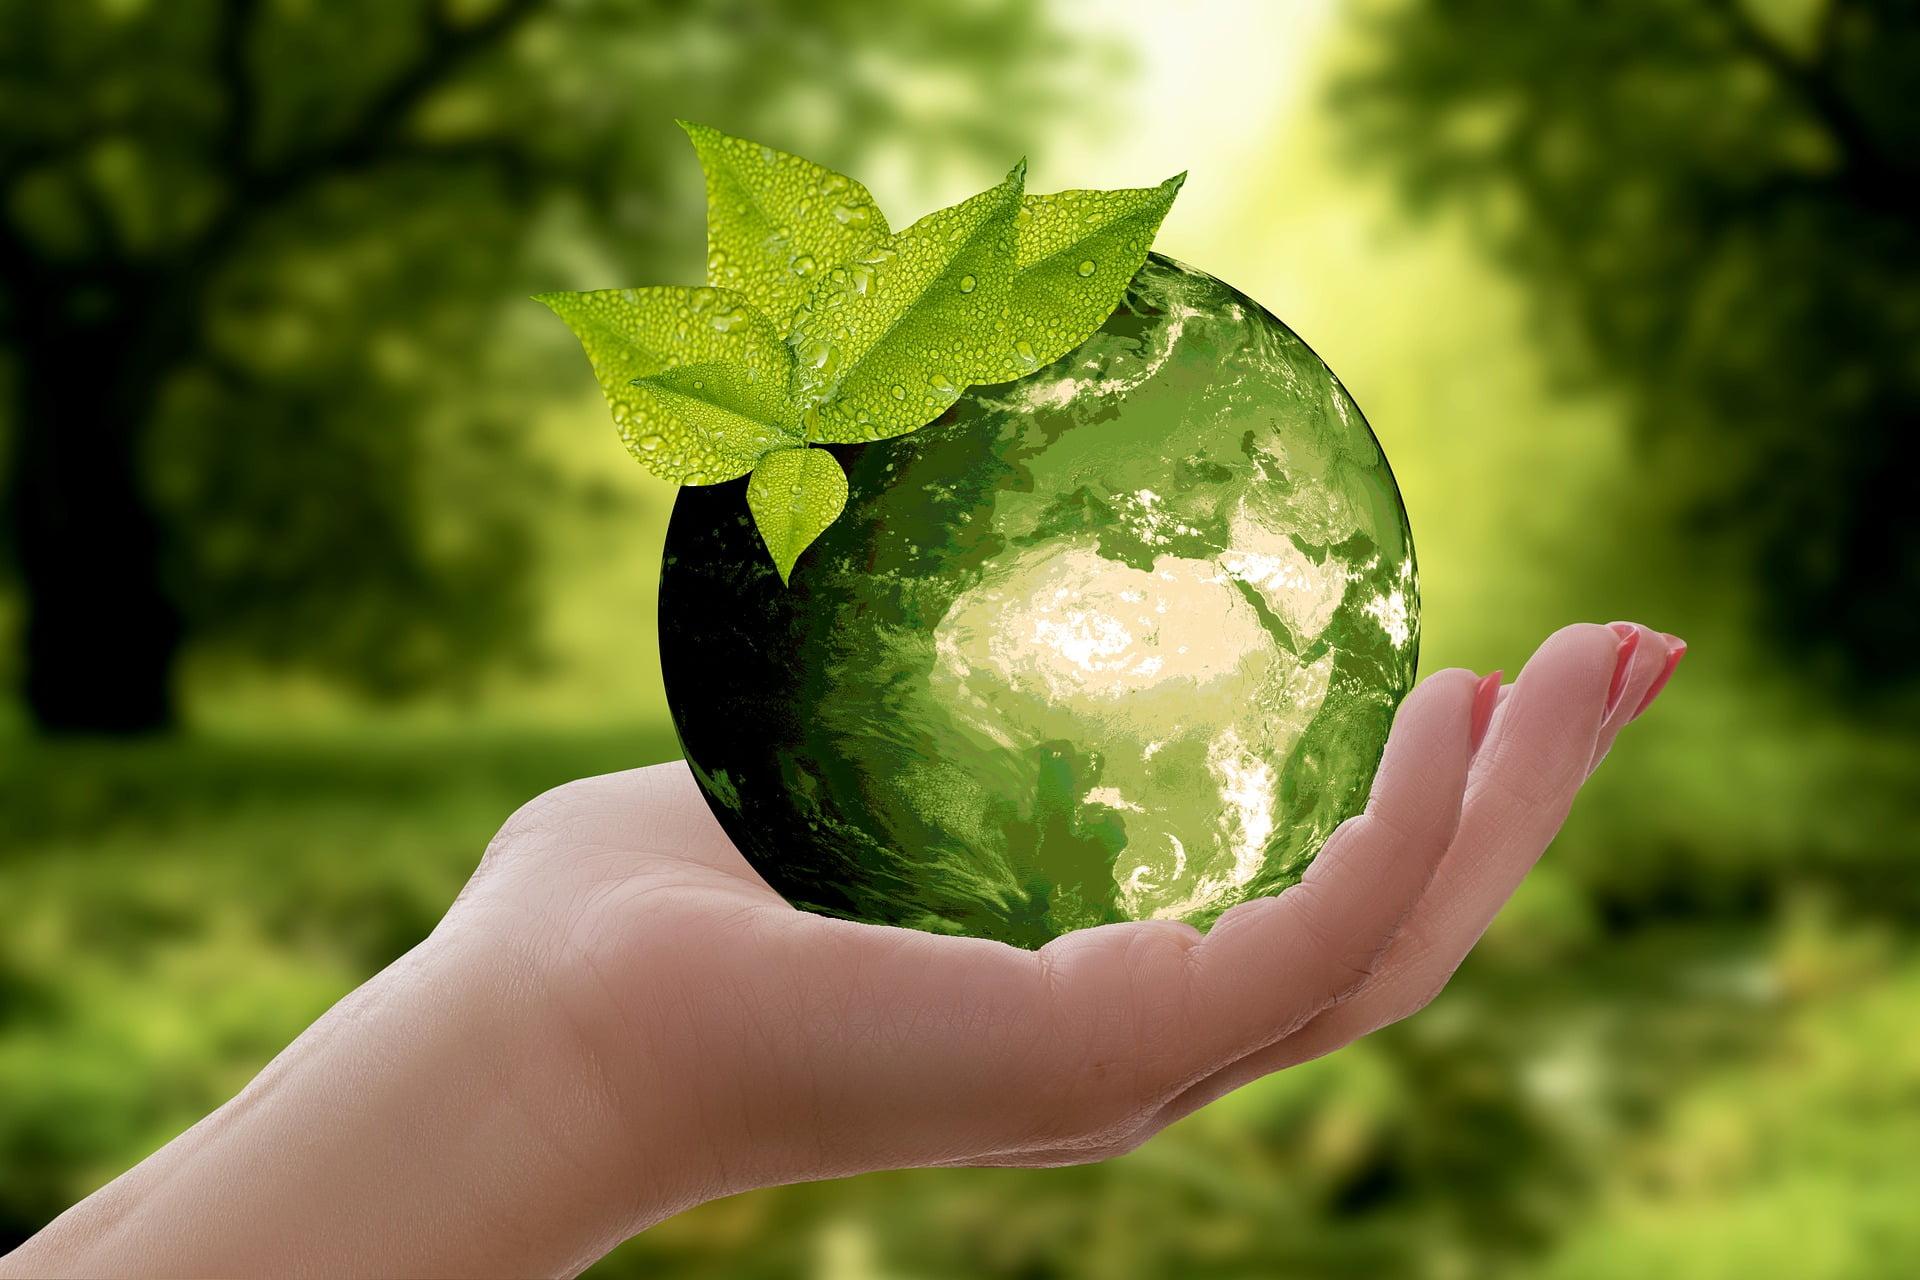 movimento-vadelata-promove-green-week-diferente-da-black-friday